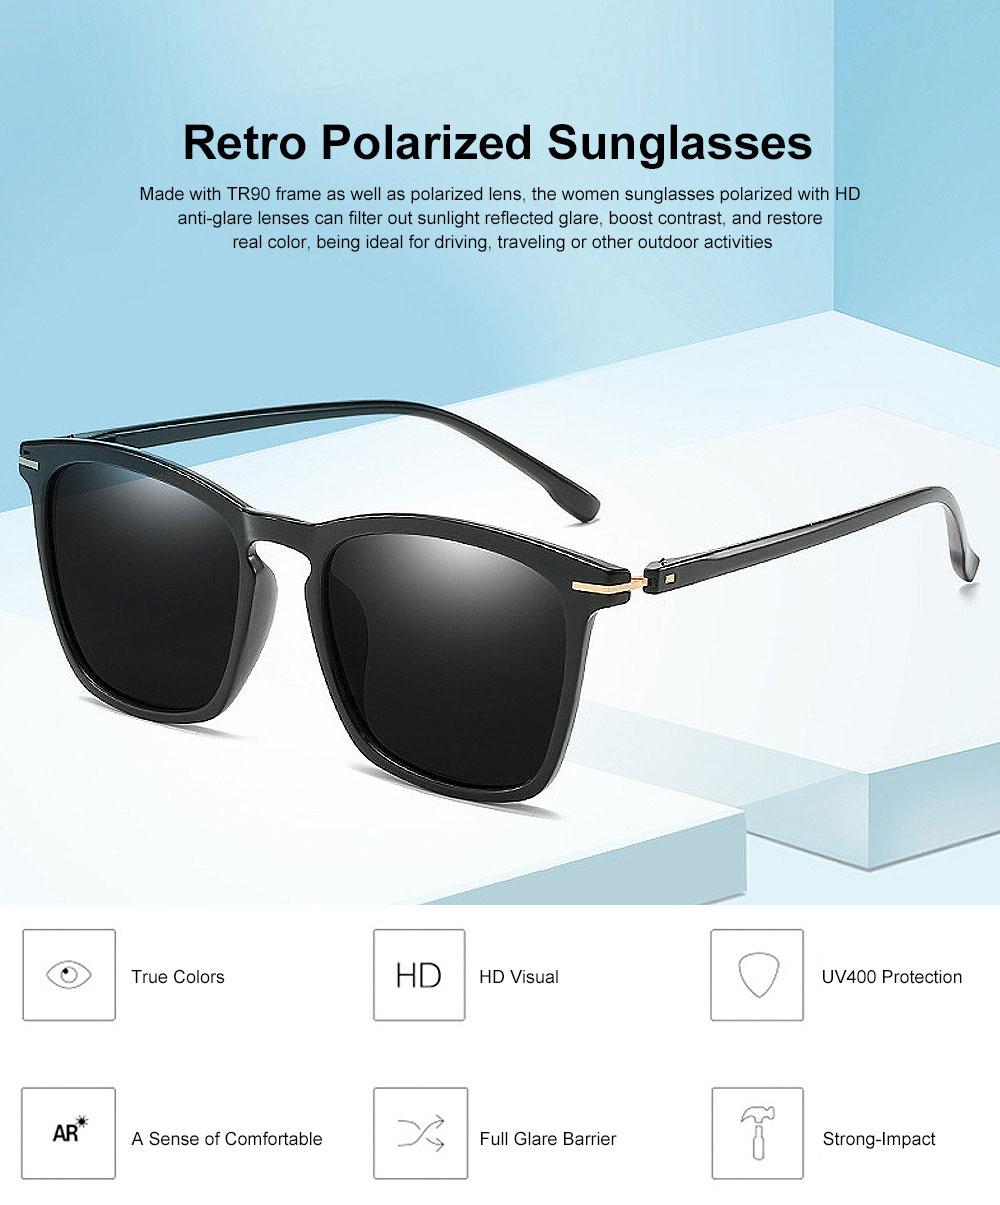 Retro Polarized Sunglasses Vintage Style with UV400 Protection & Anti-Glare Lens for Women 0